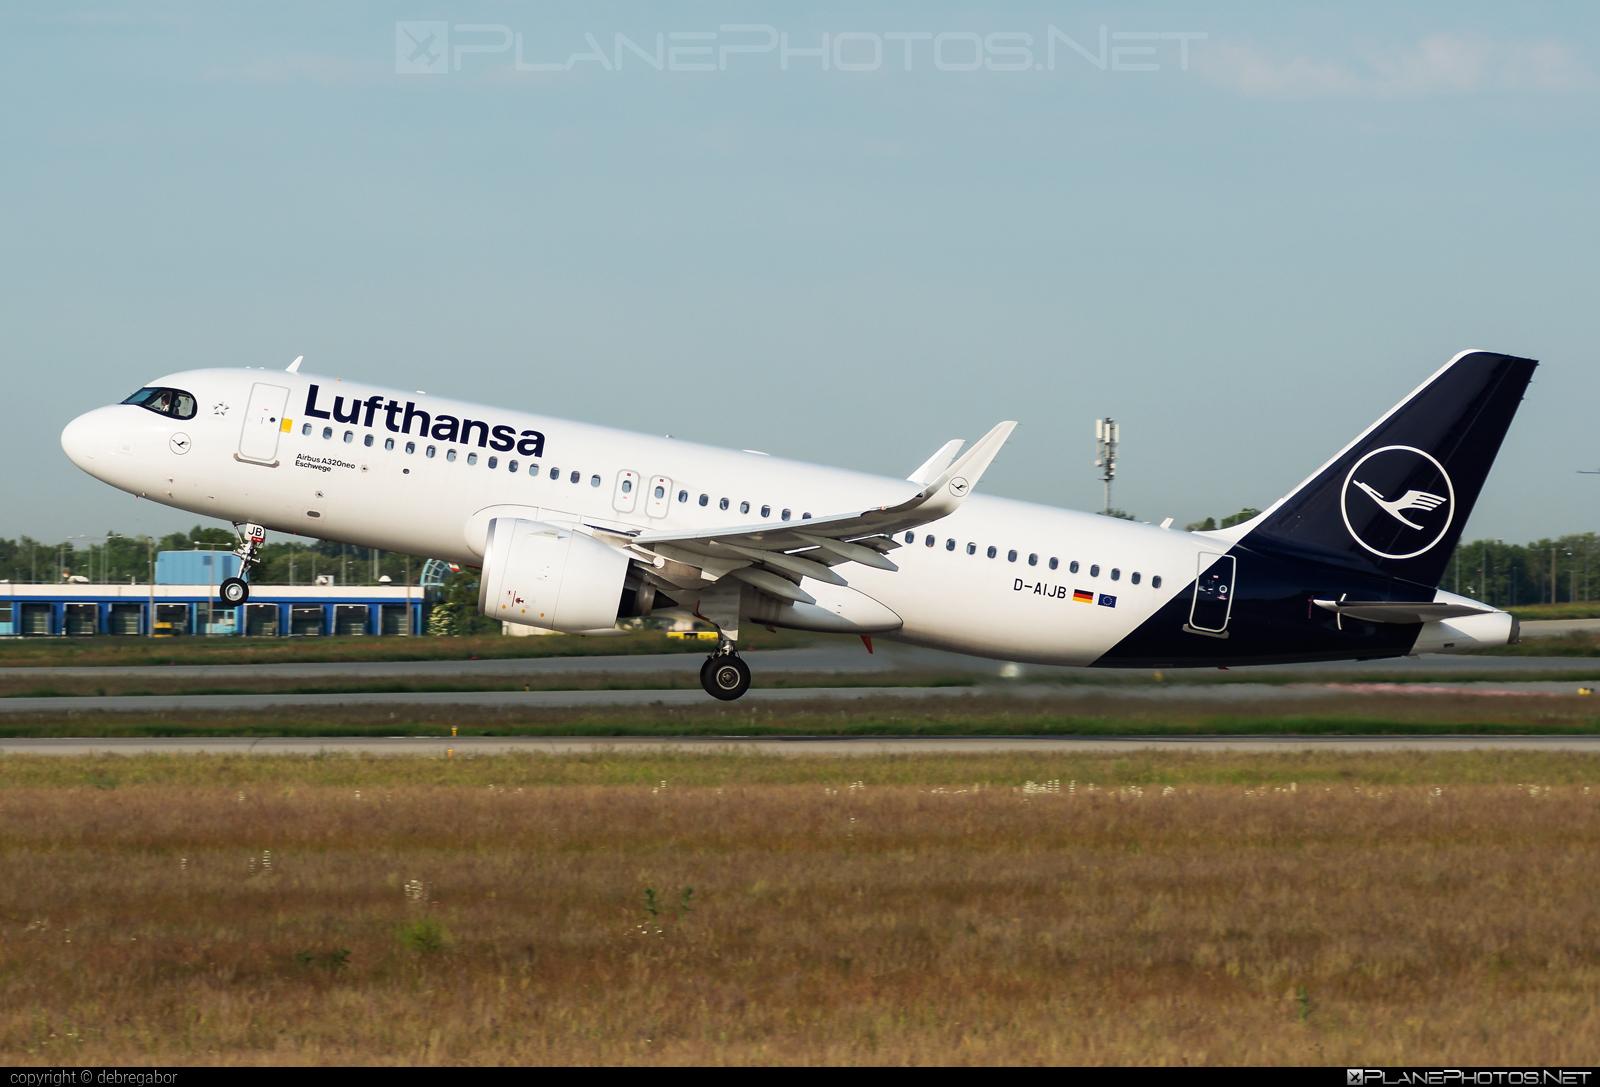 Airbus A320-271N - D-AIJB operated by Lufthansa #a320 #a320family #a320neo #airbus #airbus320 #lufthansa